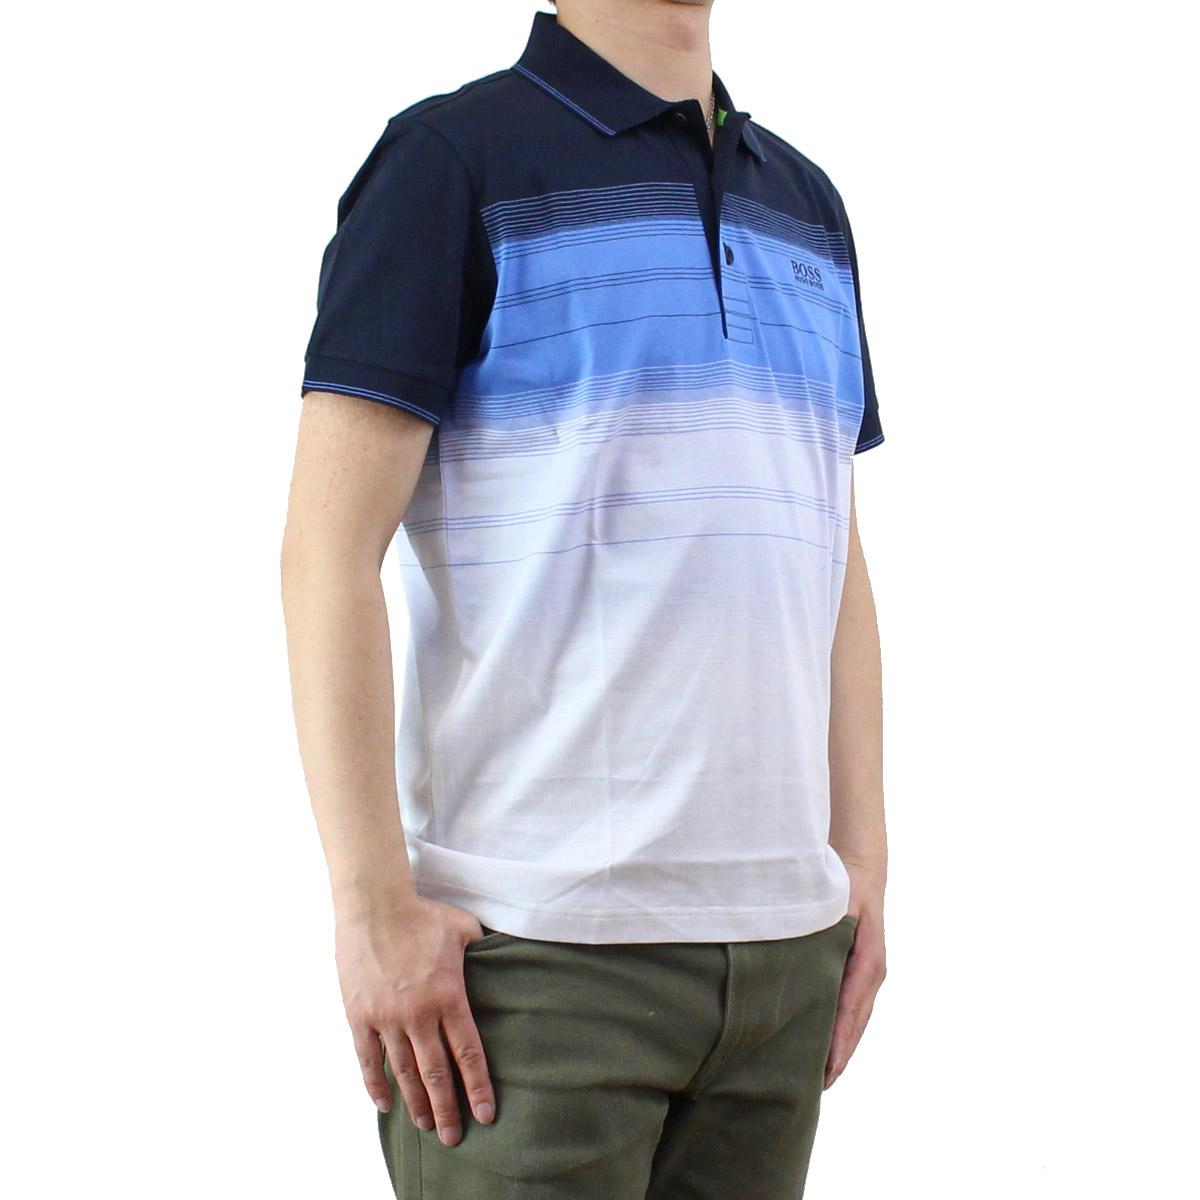 631eebaf Bighit The total brand wholesale: Hugo boss (HUGO BOSS) PADDY 3 men's polo  shirt 50330997 10196211 410 multicolored | Rakuten Global Market